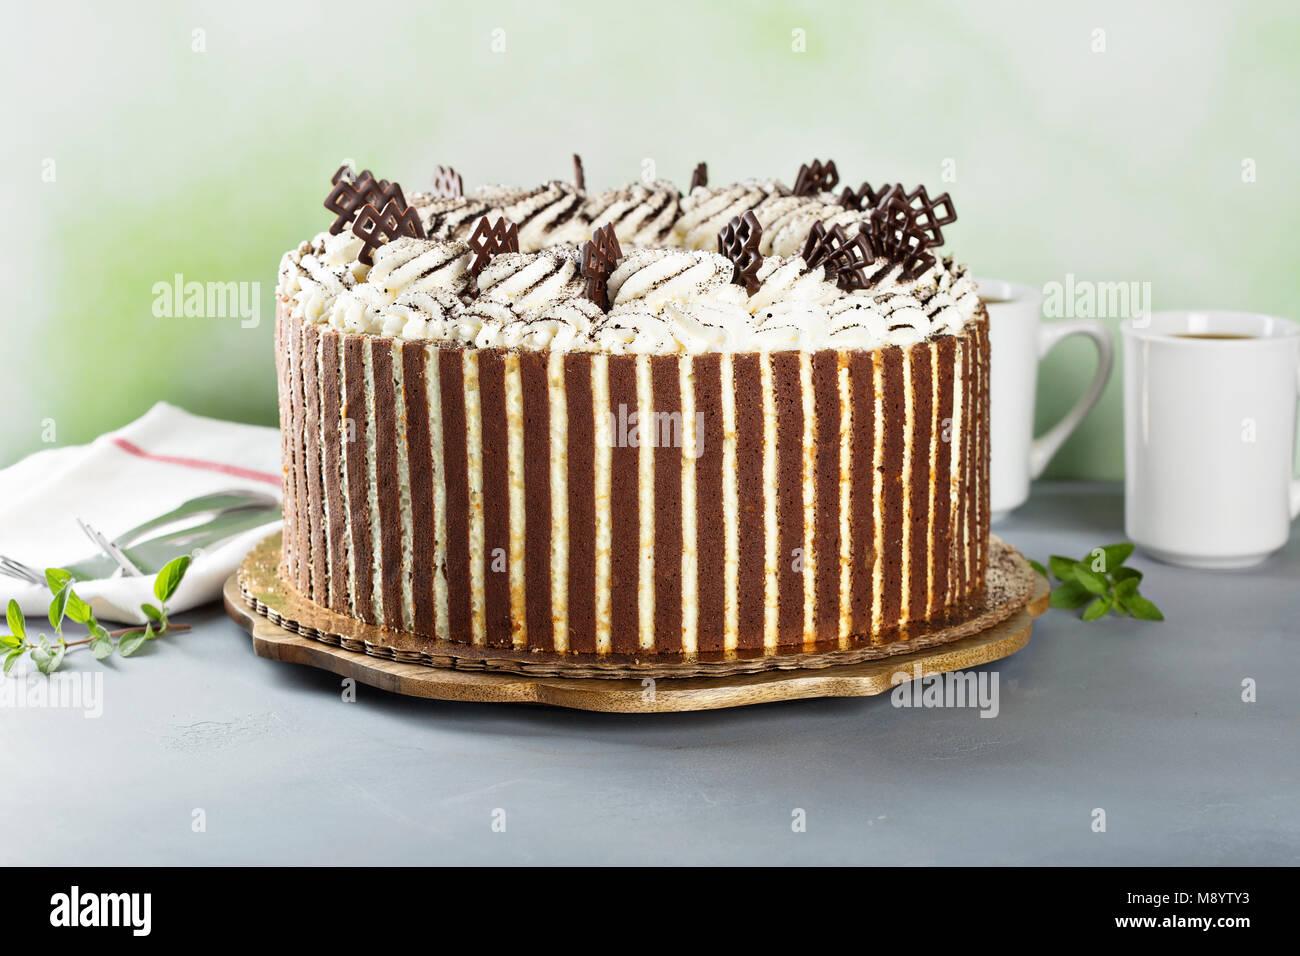 Tiramisu pastel de chocolate decoración Imagen De Stock